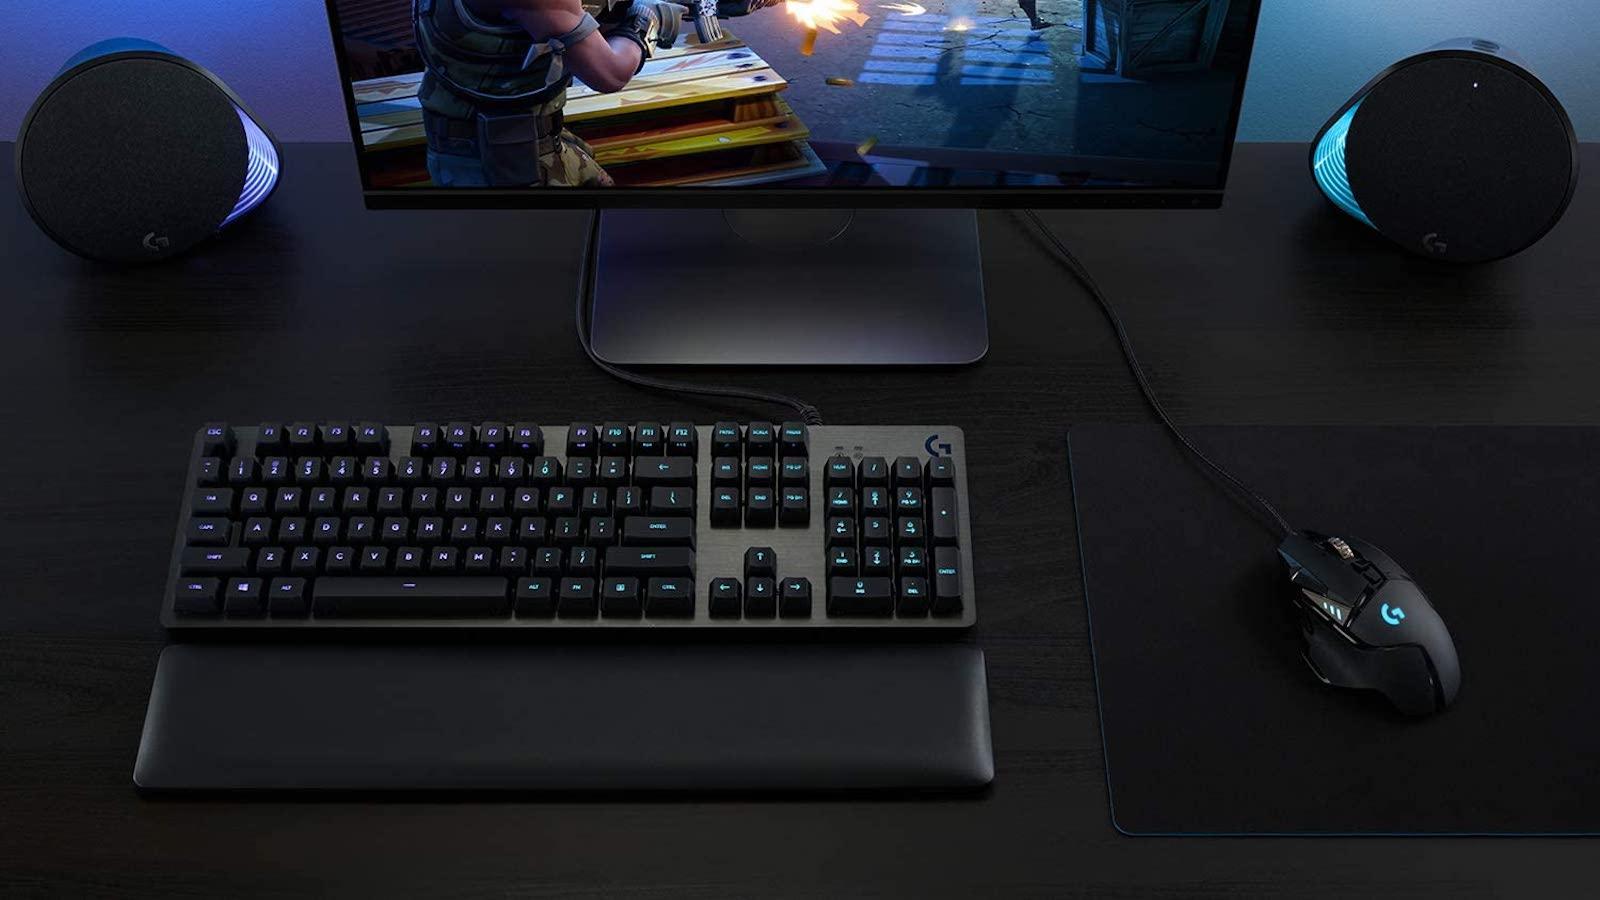 Logitech G502 HERO high-performance gaming mouse has an advanced optical sensor